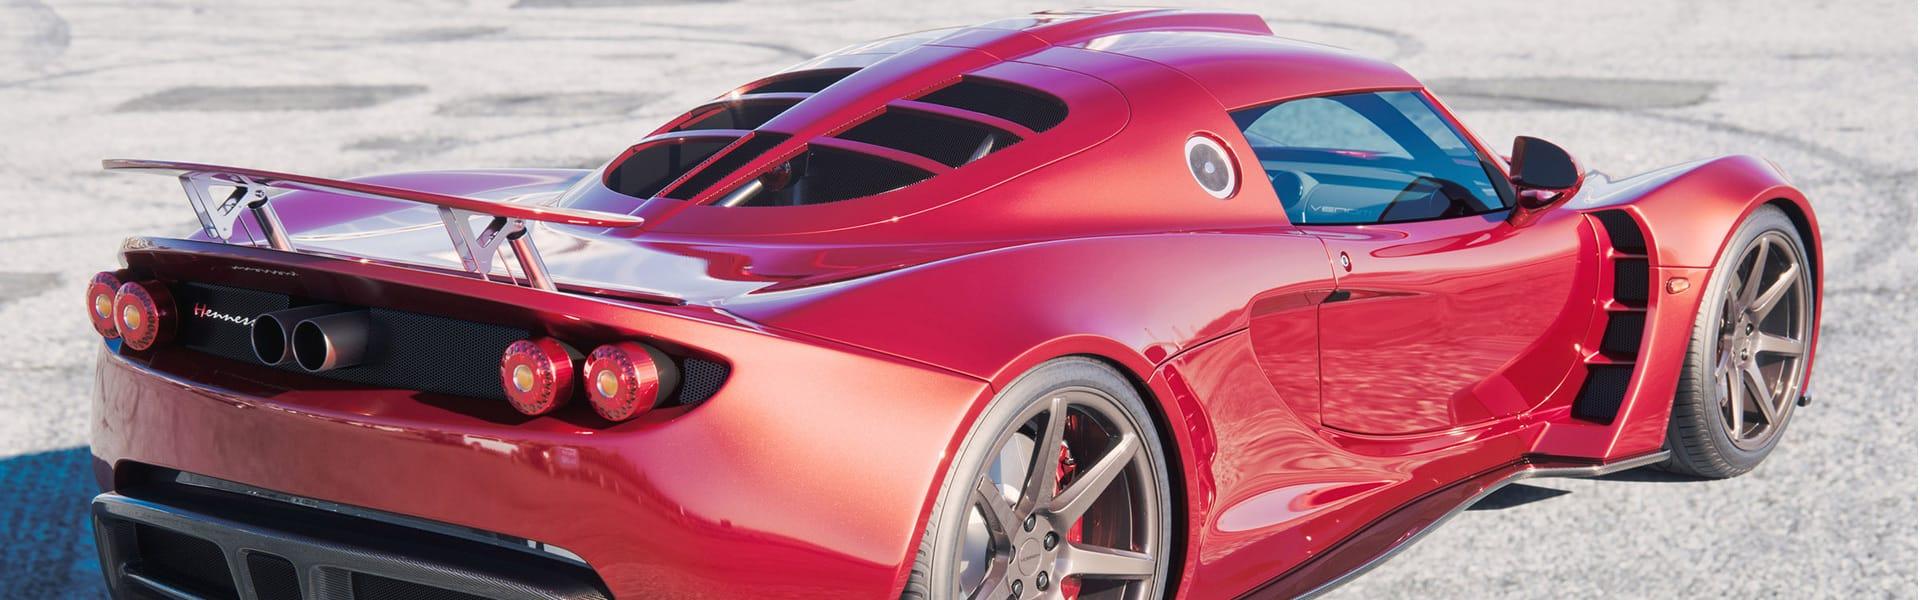 bugatti car paint vrscans material